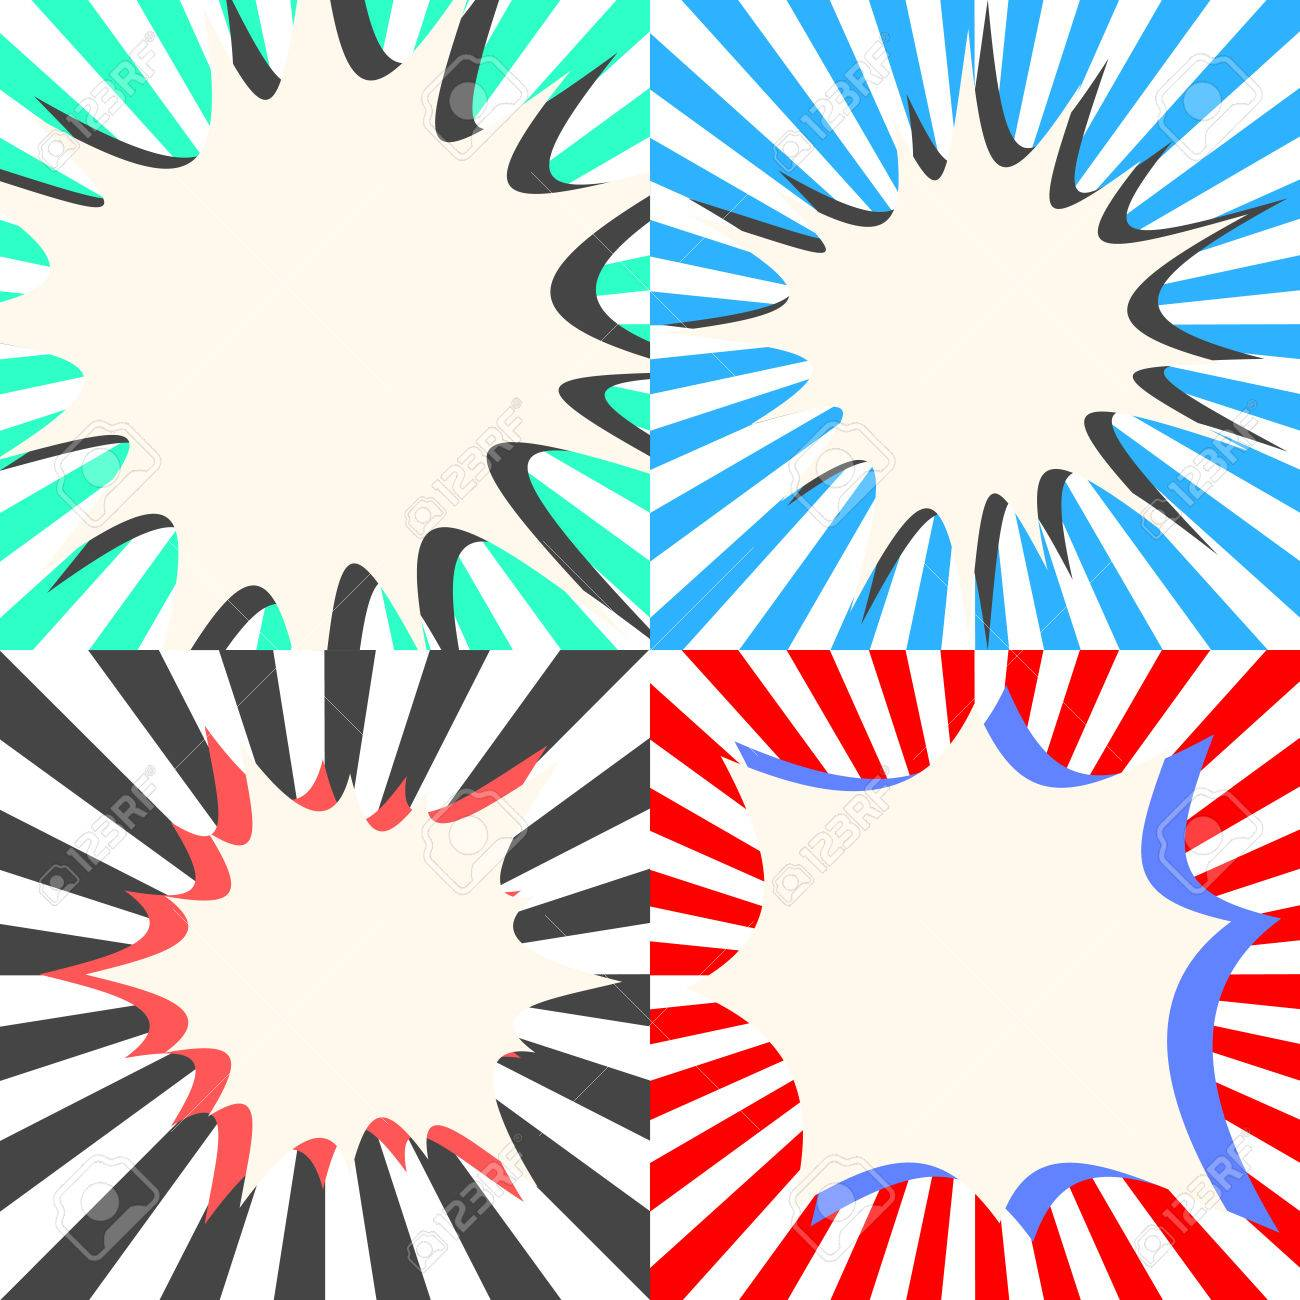 comic book vector bubble effects set sunburst ray background rh 123rf com sunburst vector free download sunburst vector photoshop